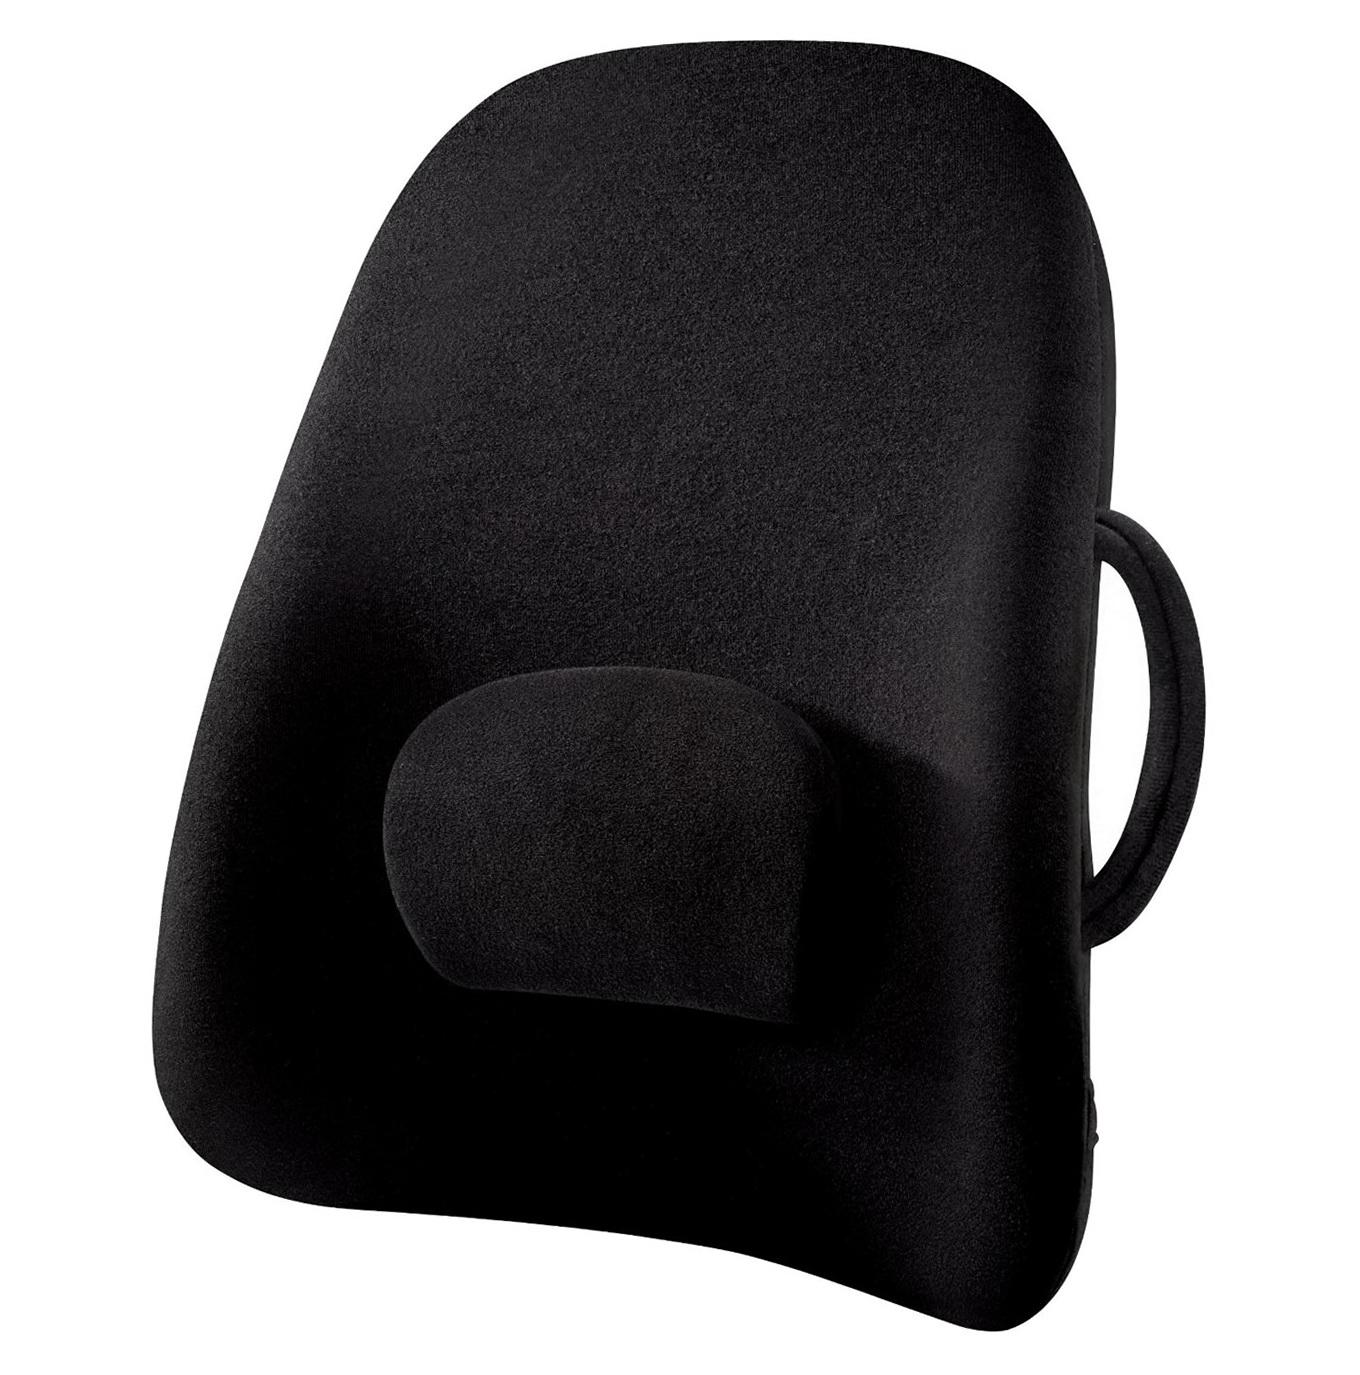 cushion for car seat for short people home design ideas. Black Bedroom Furniture Sets. Home Design Ideas